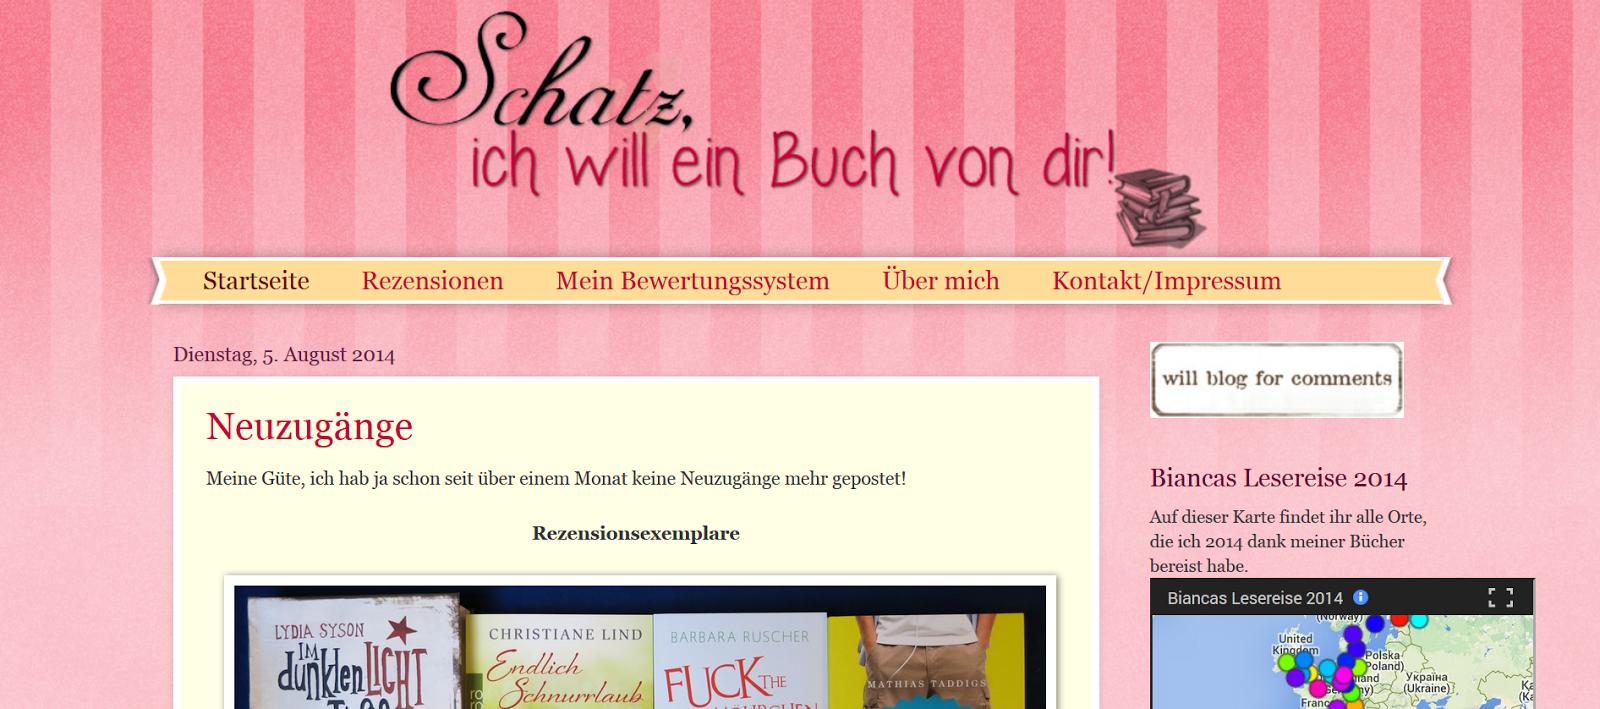 http://schatzichwilleinbuchvondir.blogspot.de/